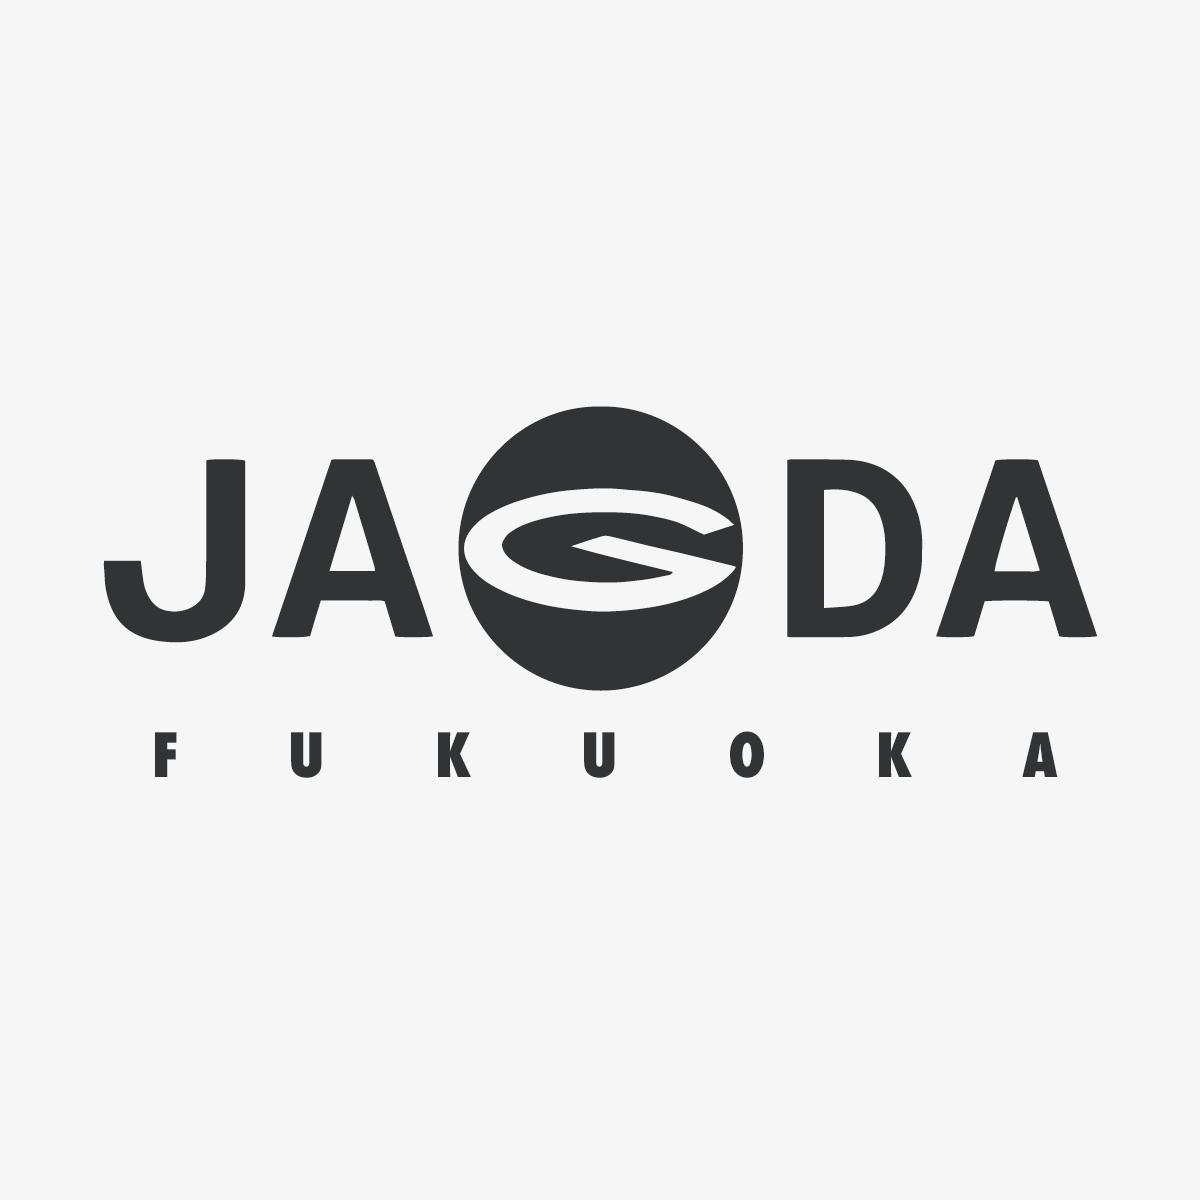 JAGDA 福岡地区